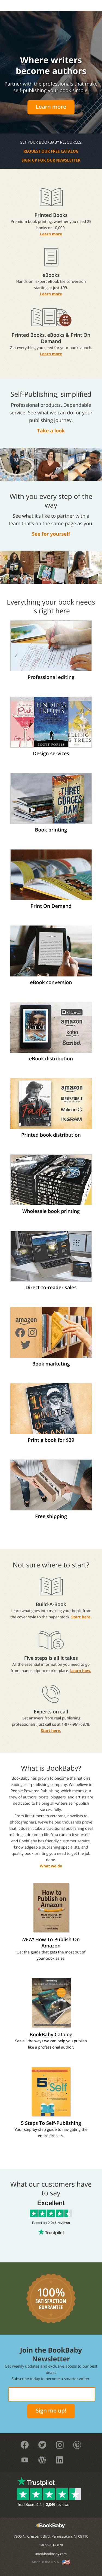 BookBaby Coupon